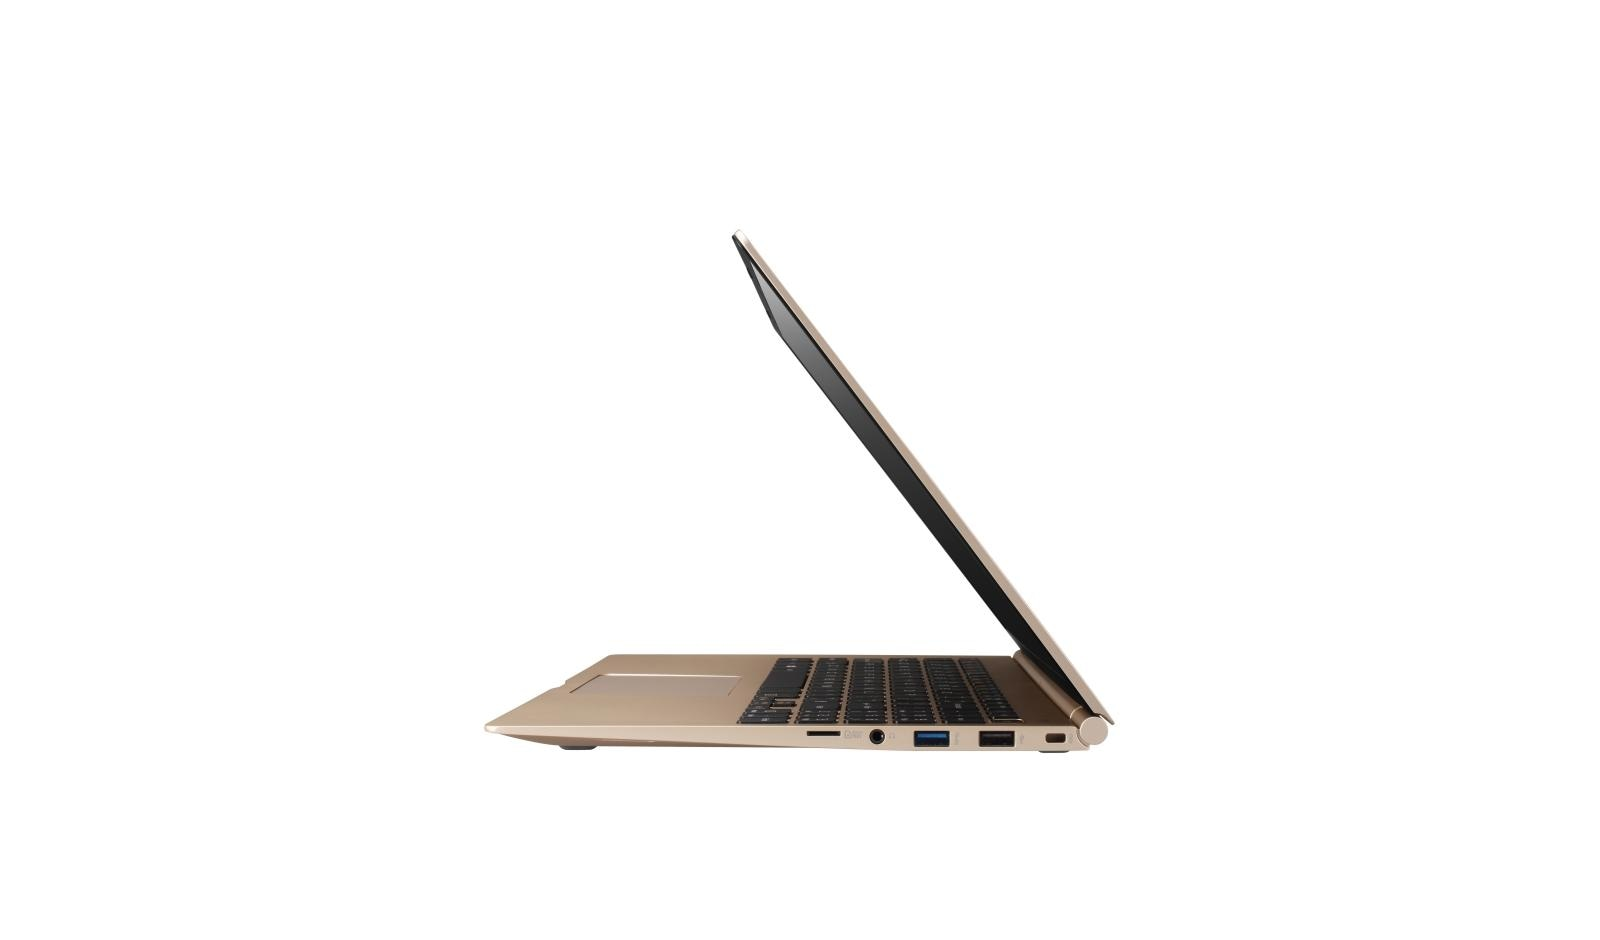 Lg 15z960 Aaa75u1 Gram 15 Core I7 Processor Ultra Slim Laptop Charger Circuit Diagram 10 Battery Schematic 2016 Usa